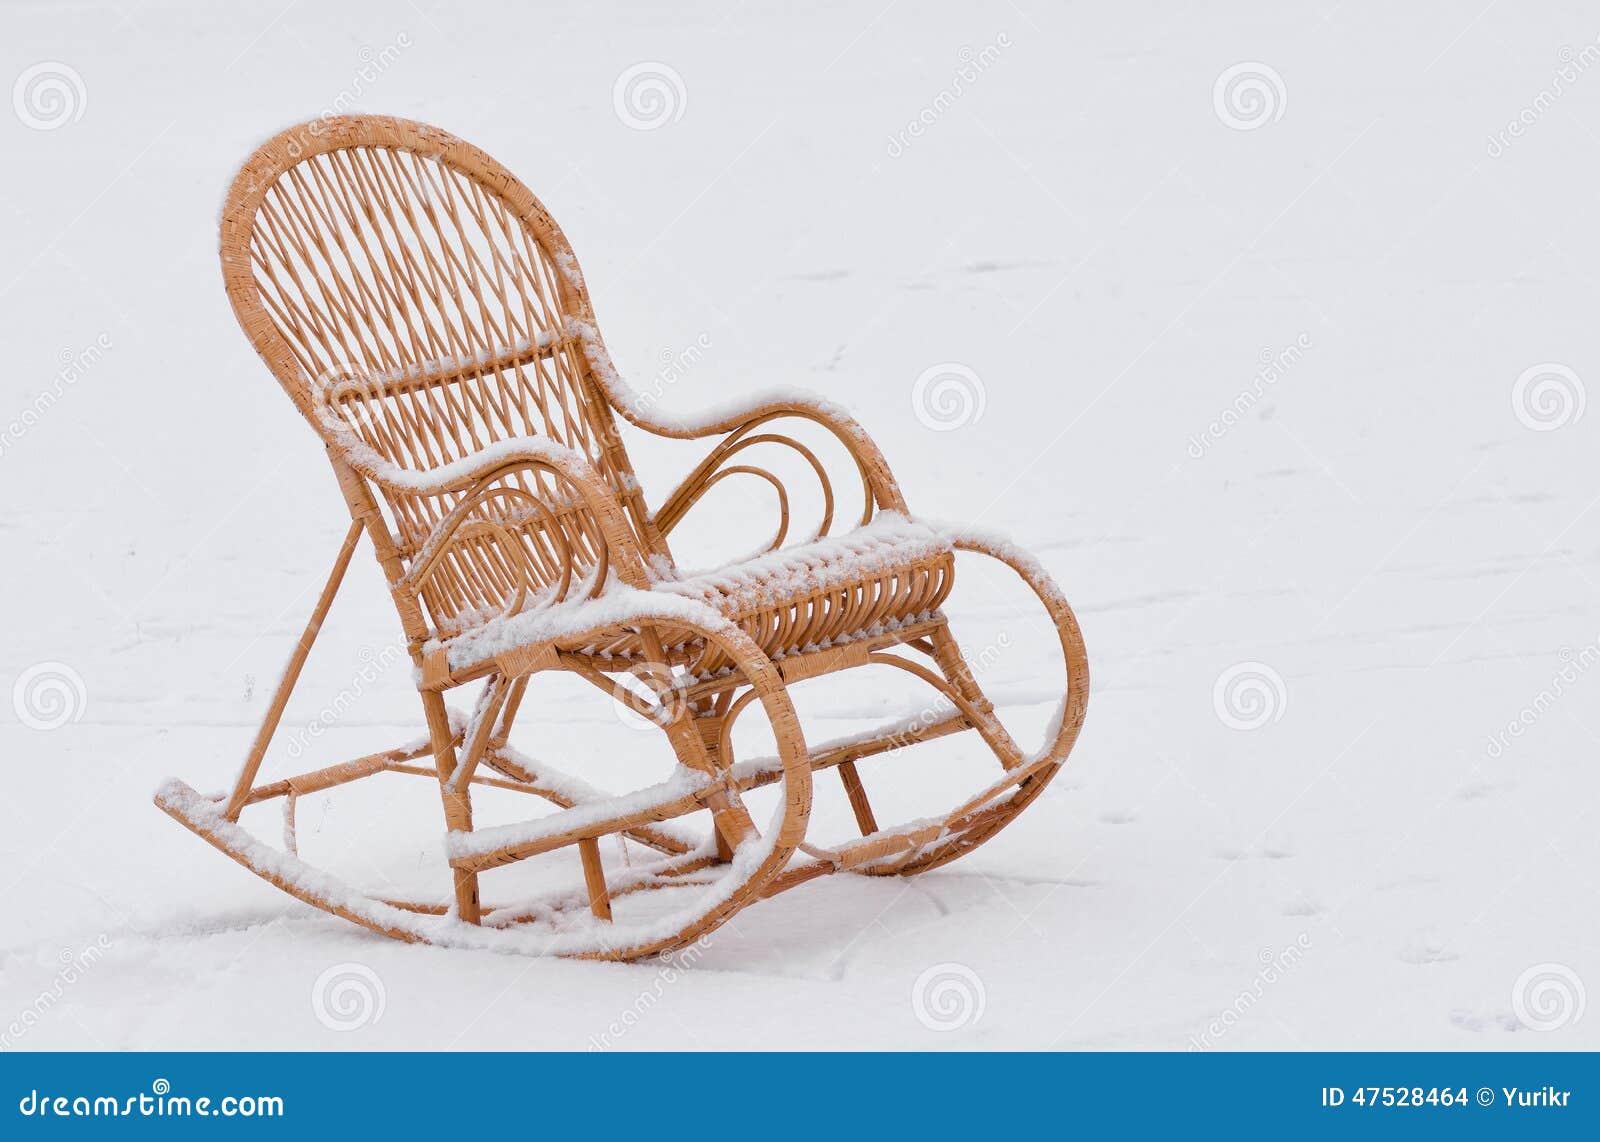 Basculer chaise en osier sur la neige fra che photo stock - Chaise enfant en osier ...